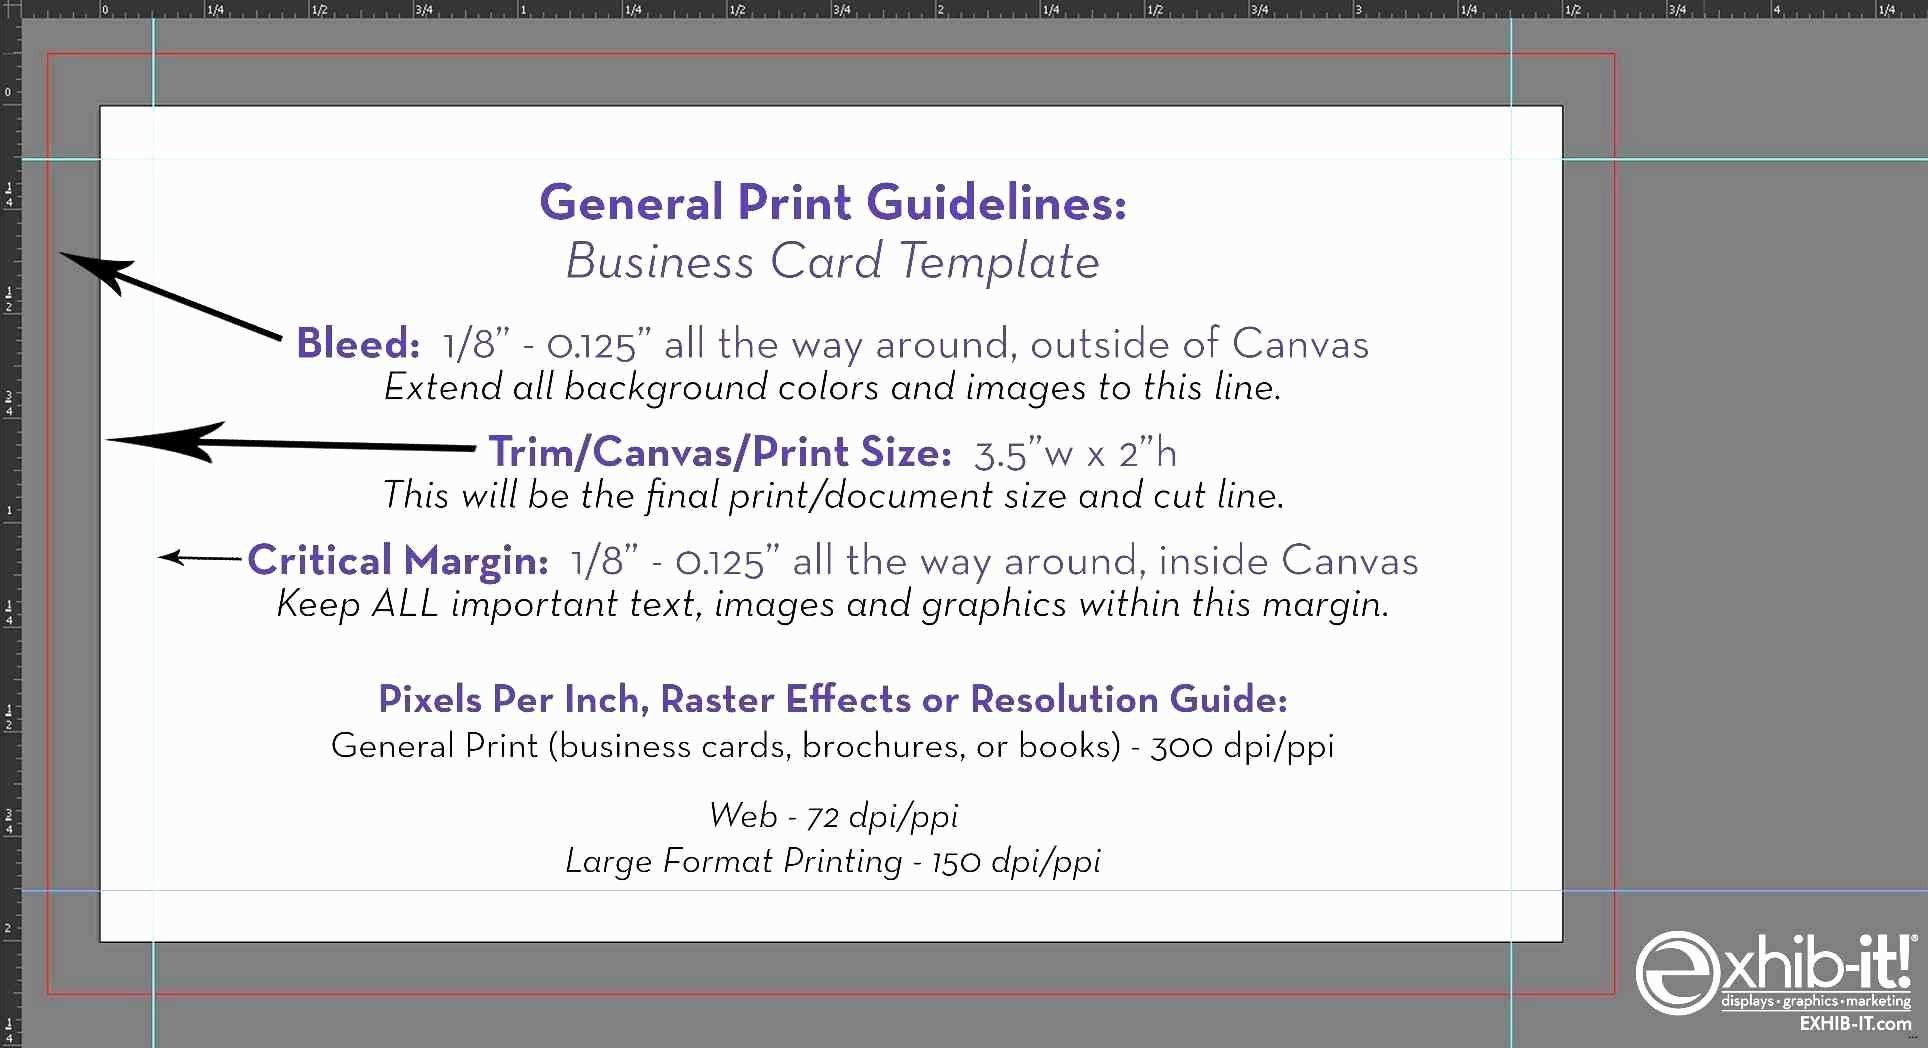 Business Card Size Template Illustrator 59 Top Zumba Business Card Template Free Real Simp Printing Business Cards Business Card Psd Business Card Template Psd